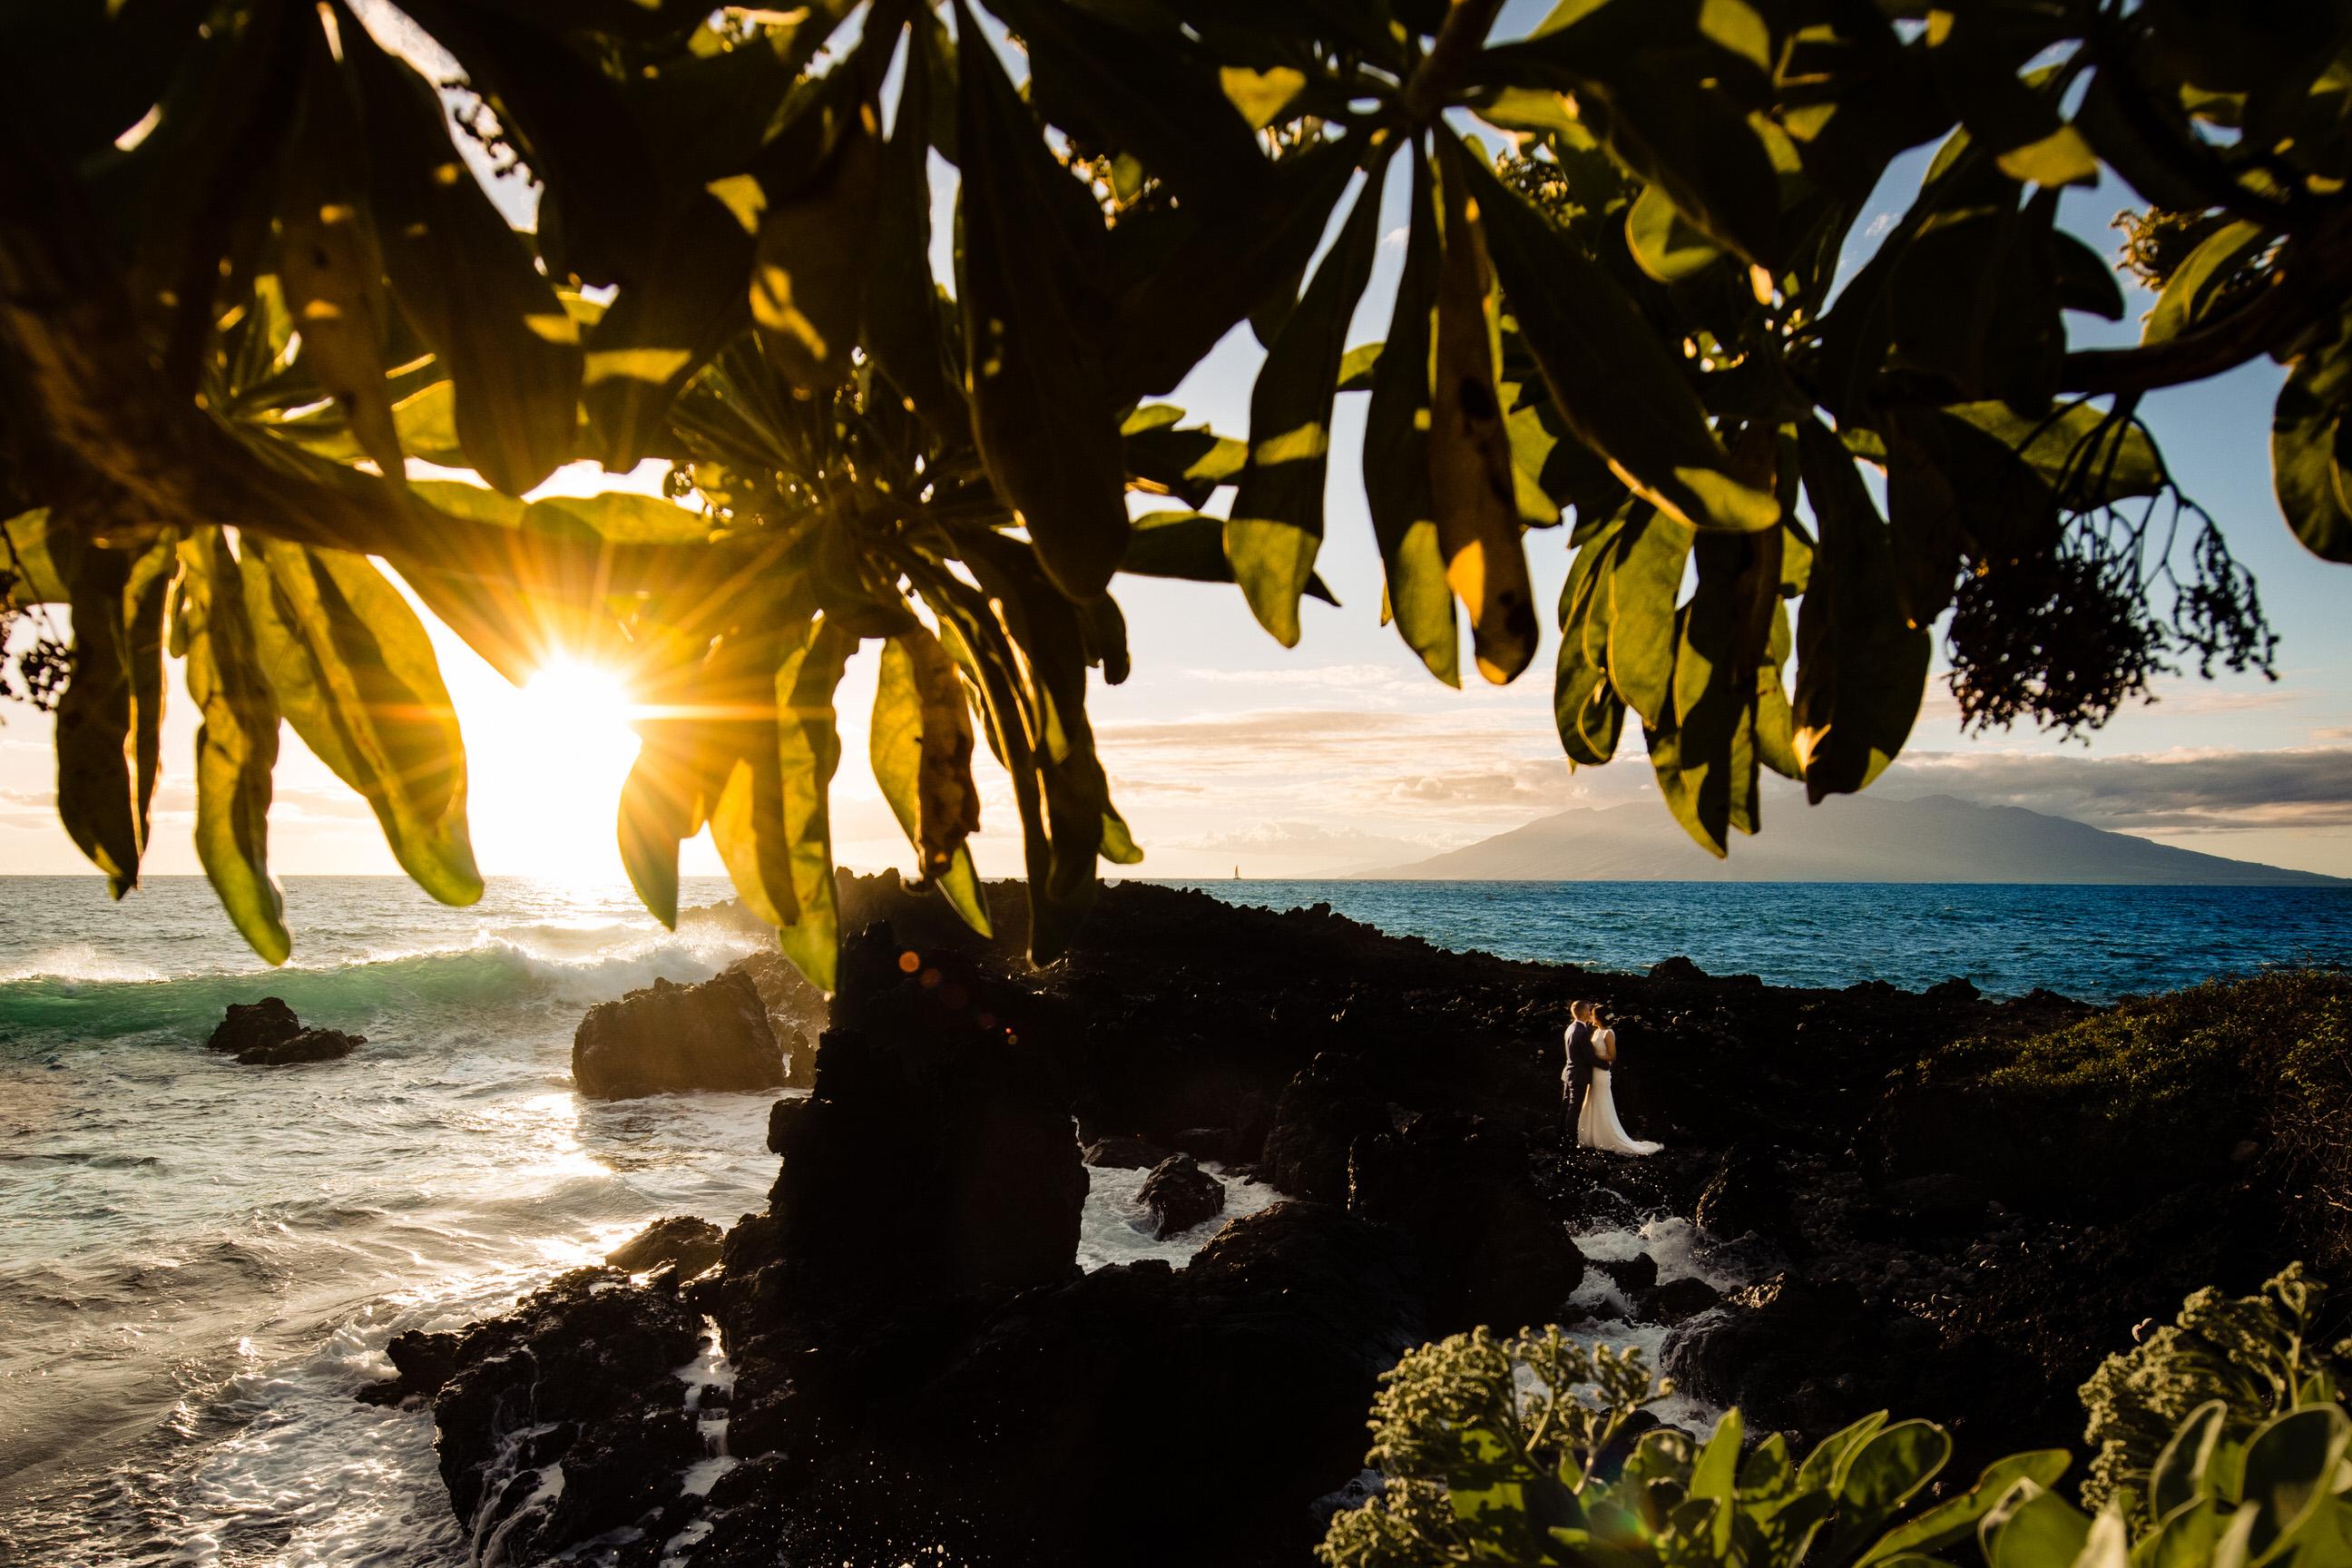 Destination couple portrait against sunset sea - photo by Angela Nelson Photography